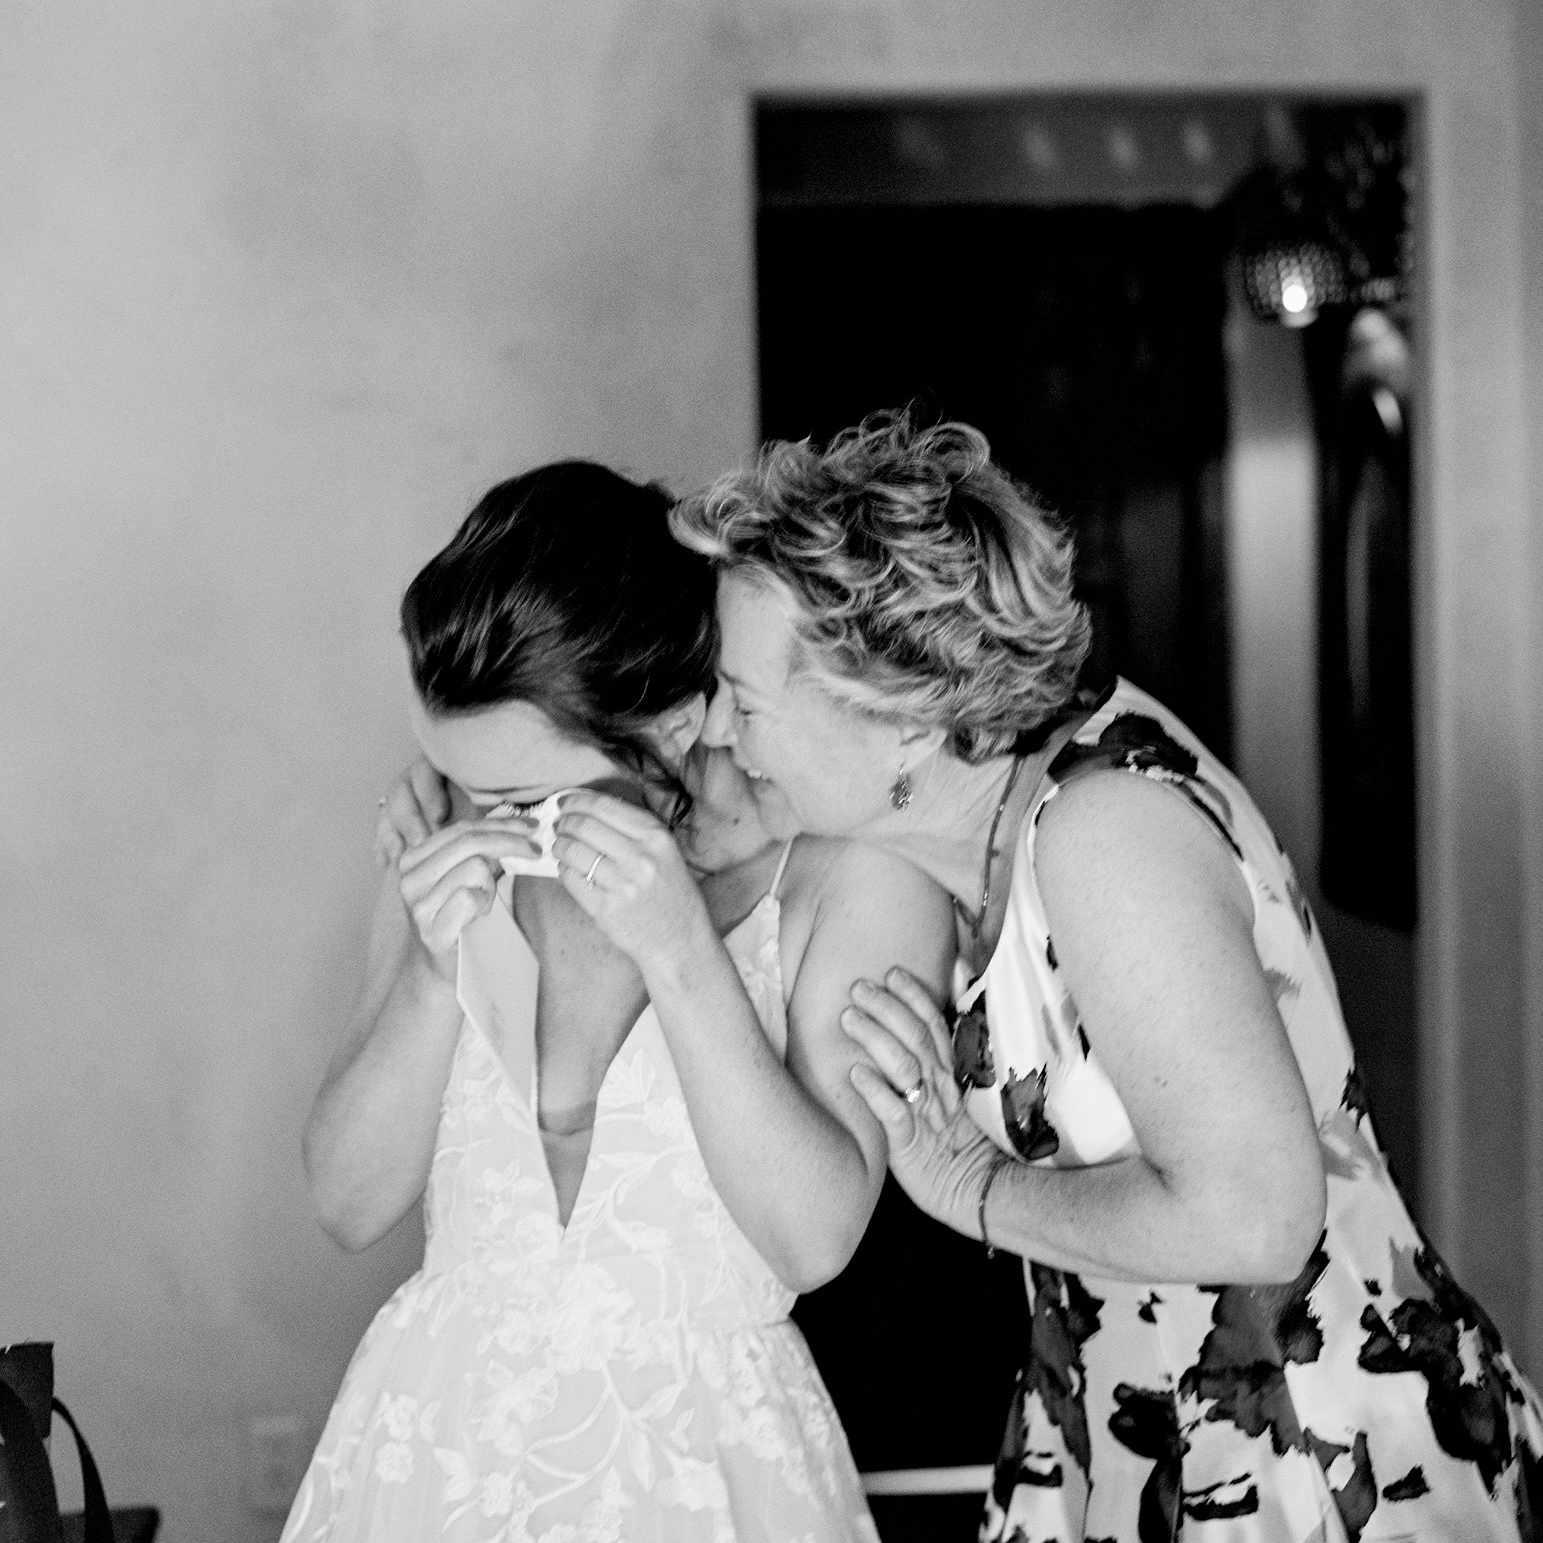 mom and bride embracing